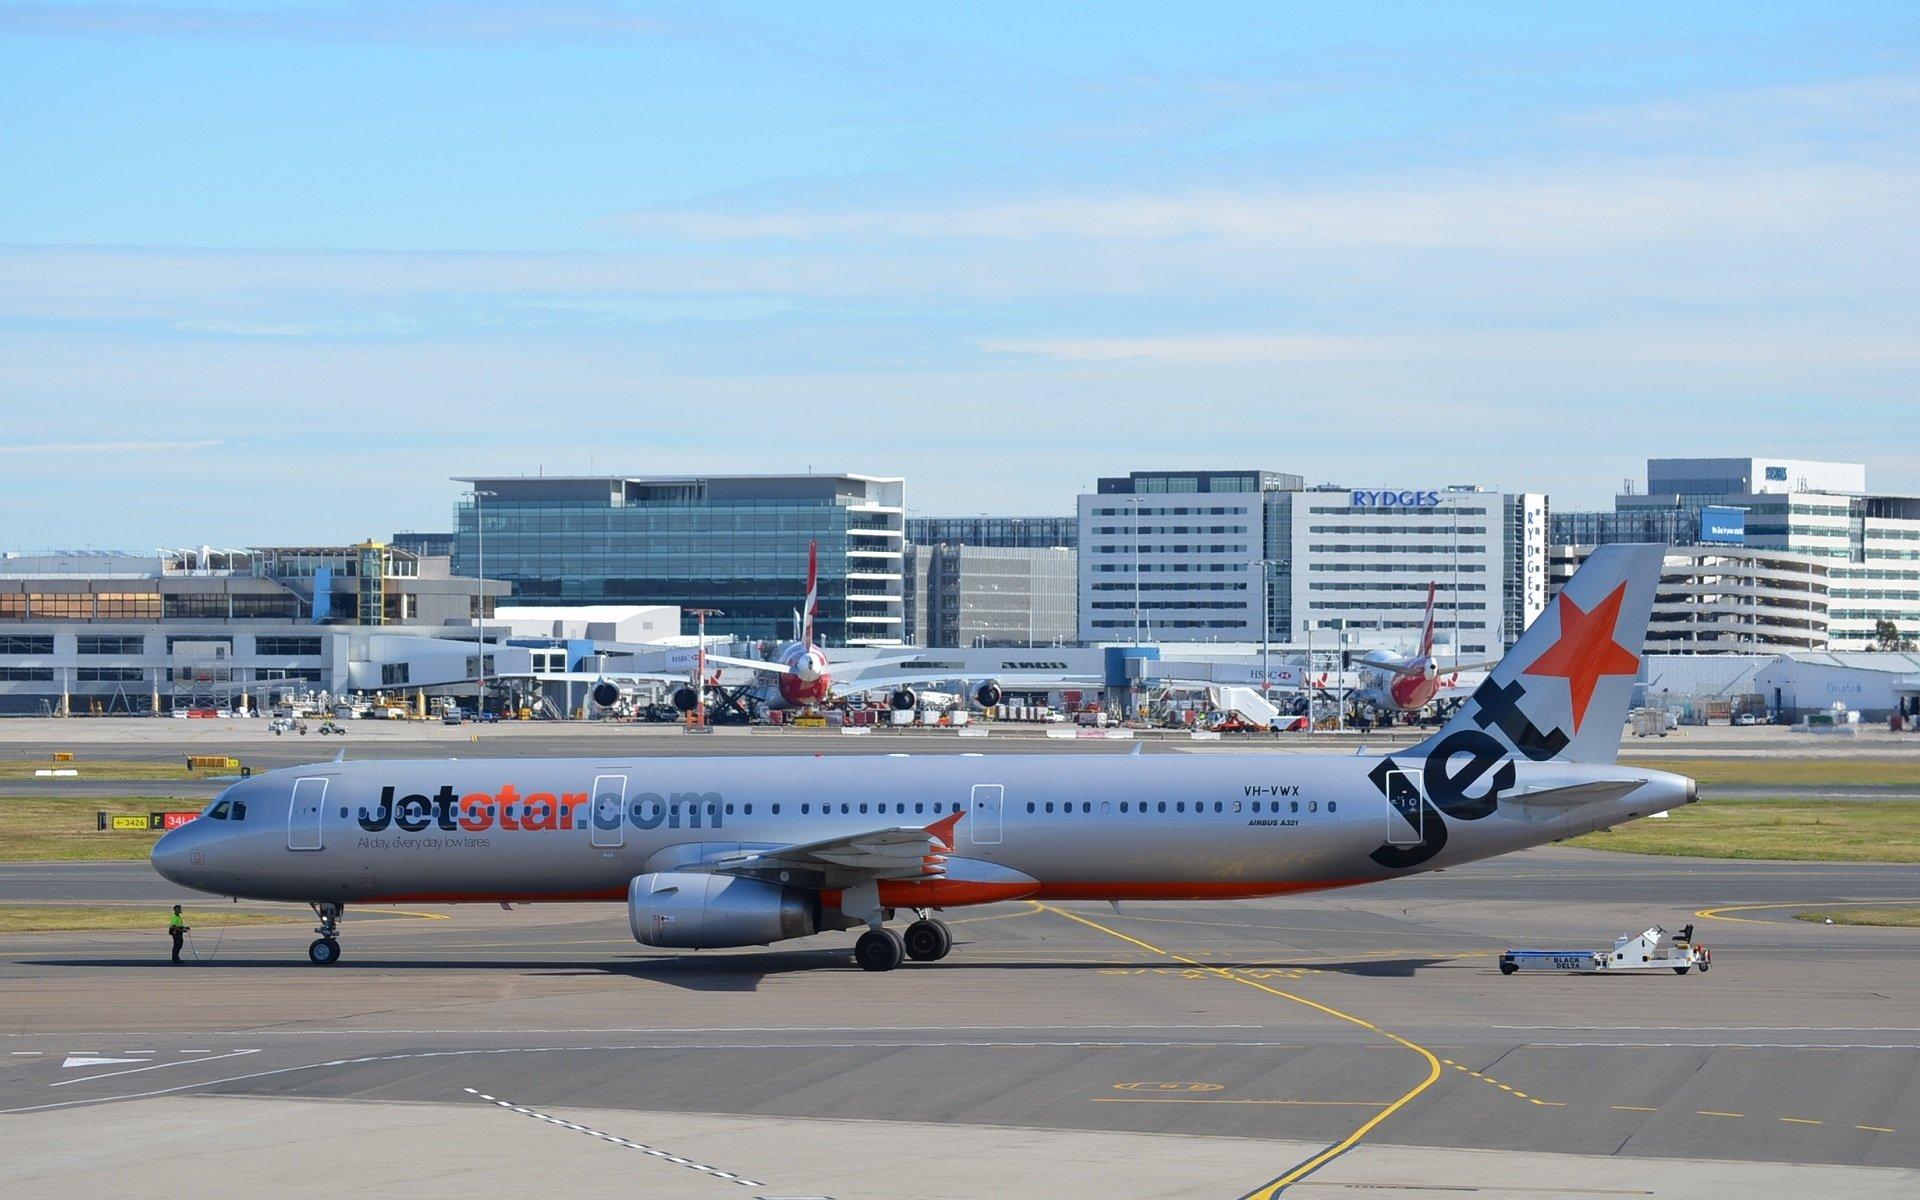 VH VWX Airbus A321 232 Jetstar At Sydney Airport HD Wallpaper 1920x1200